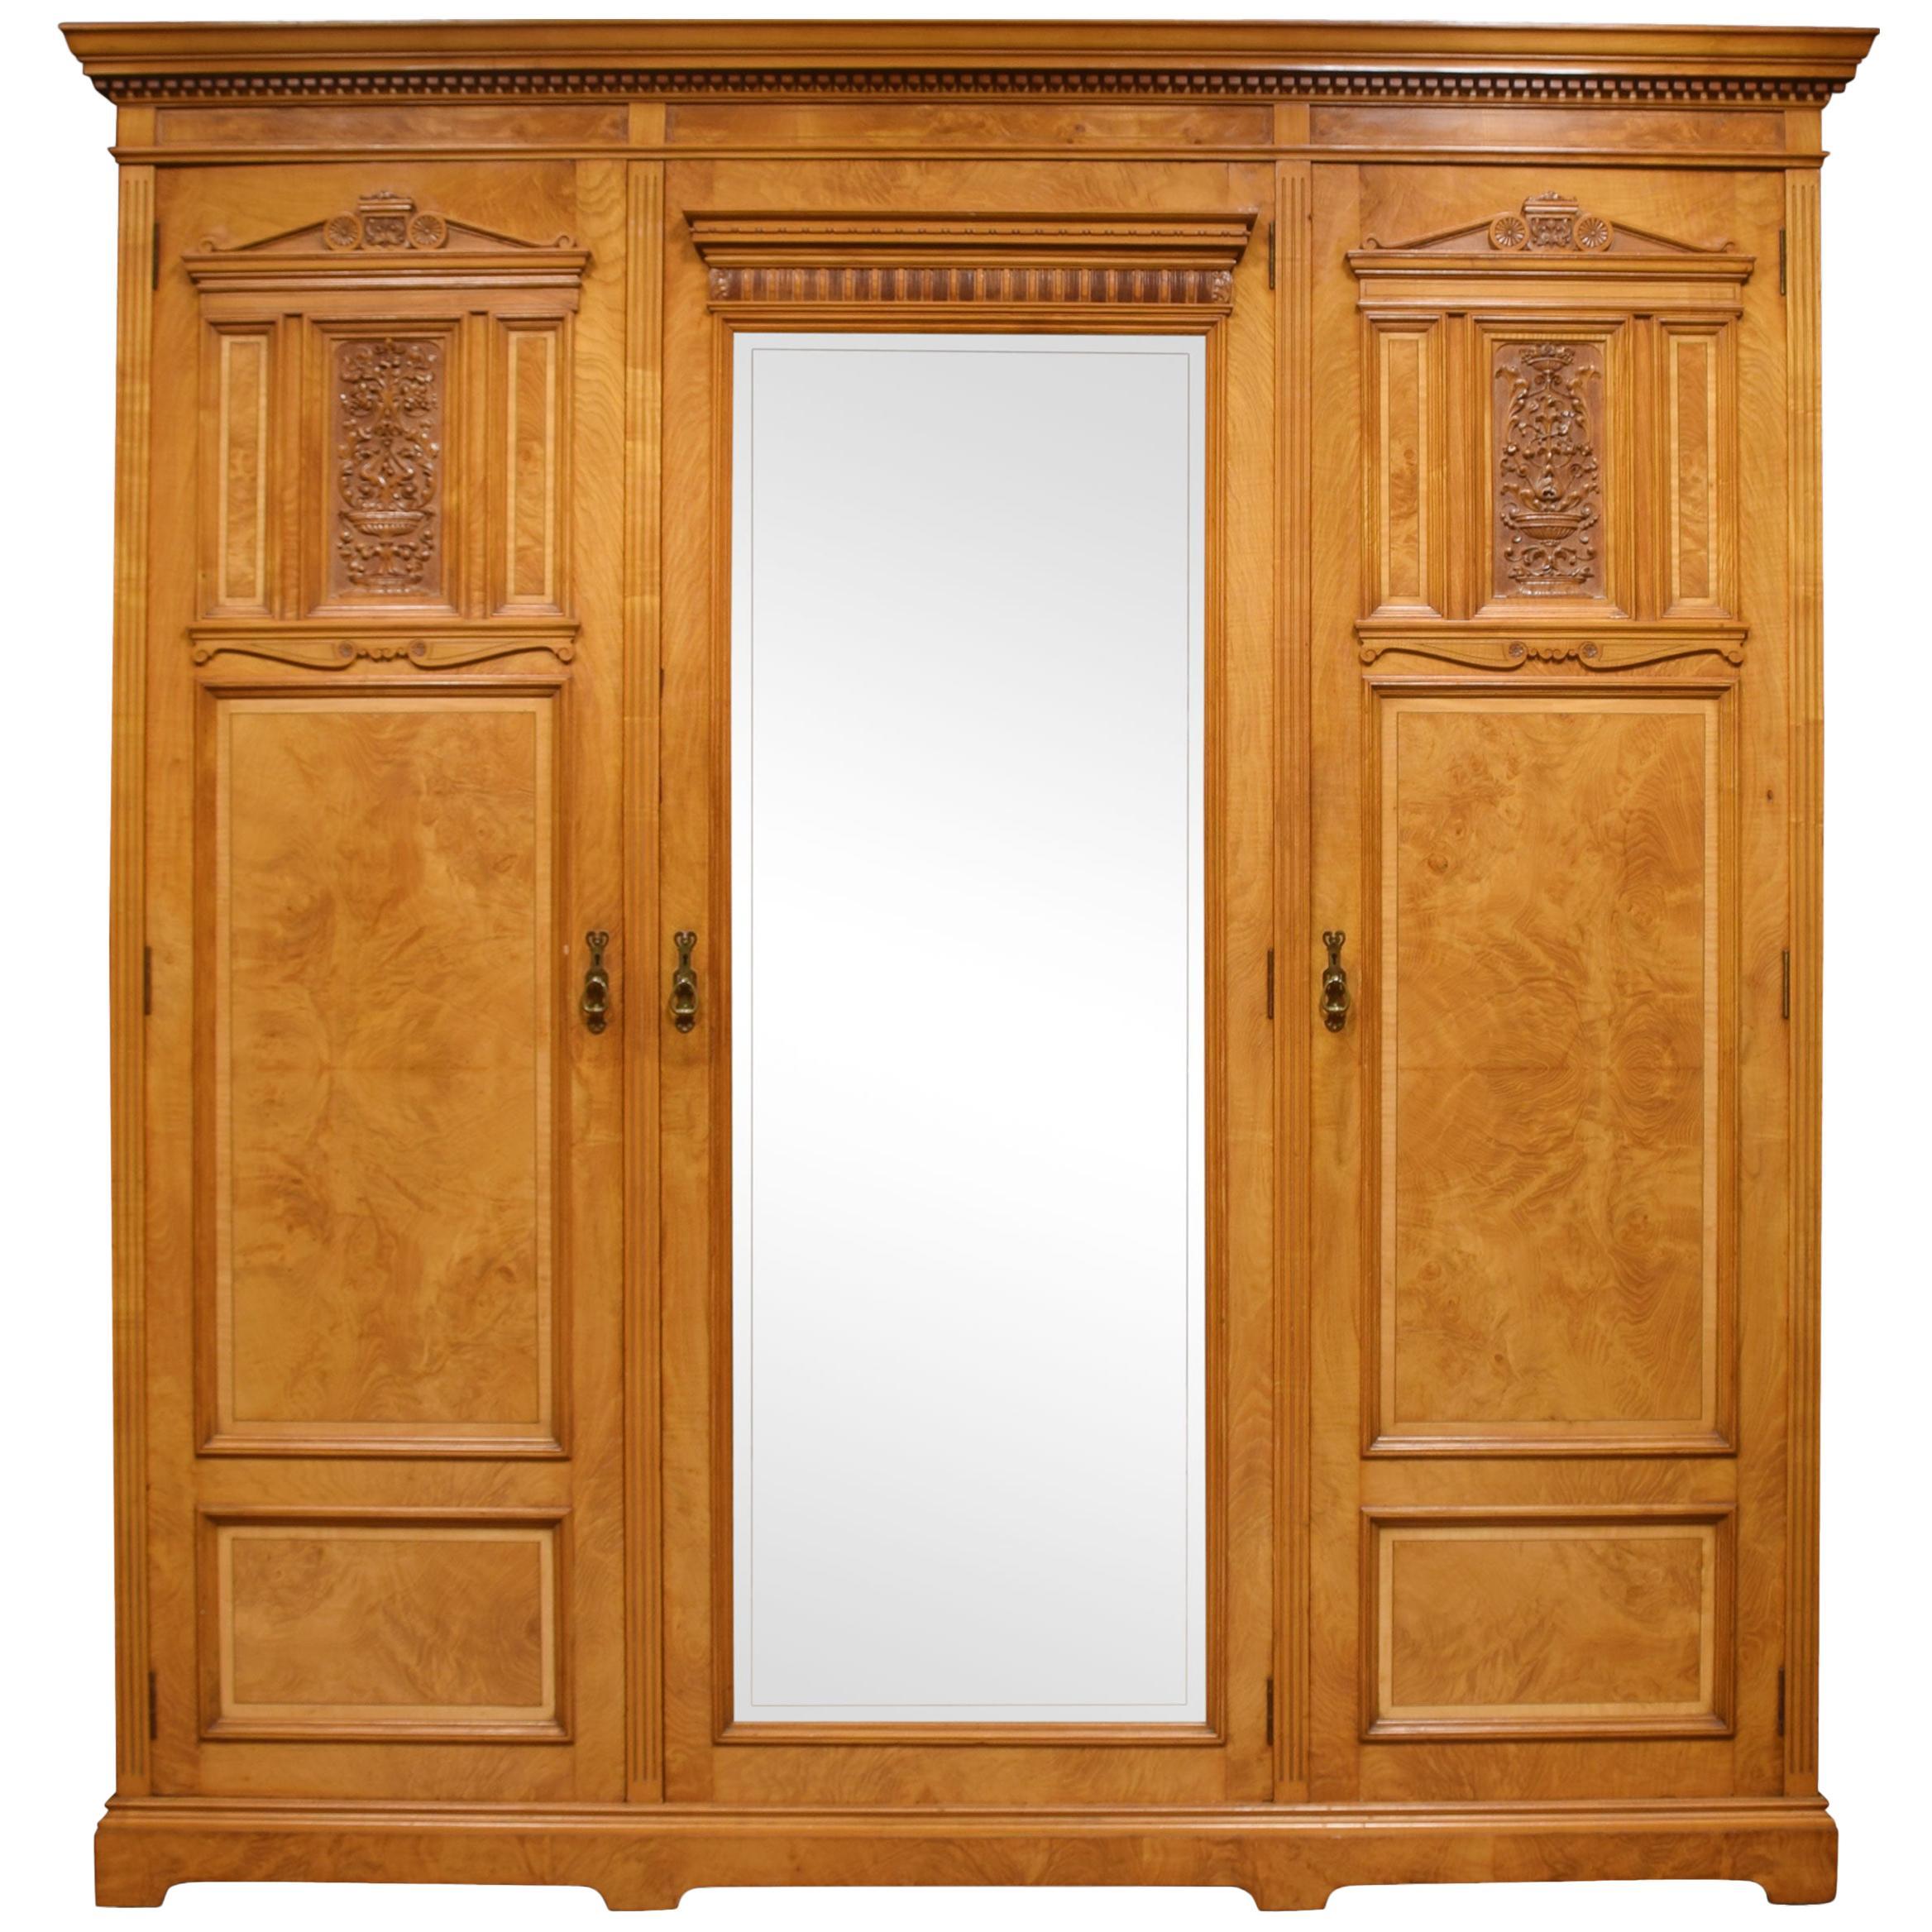 Maple and Co Three-Door Wardrobe